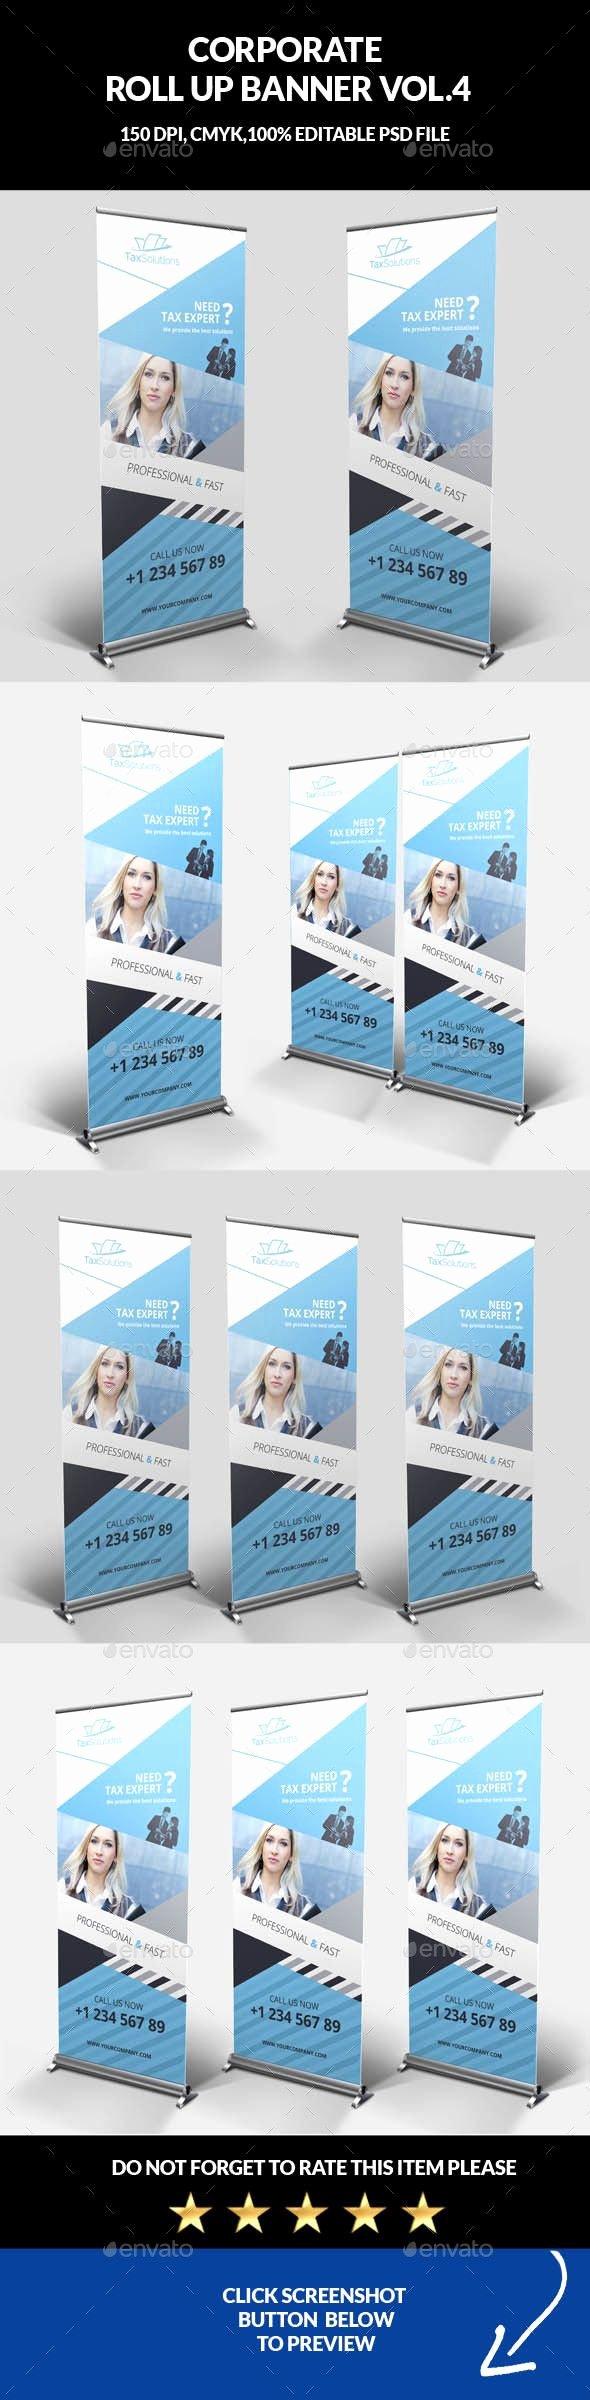 Retractable Banner Design Template Elegant 80 Best Design Banners Images On Pinterest